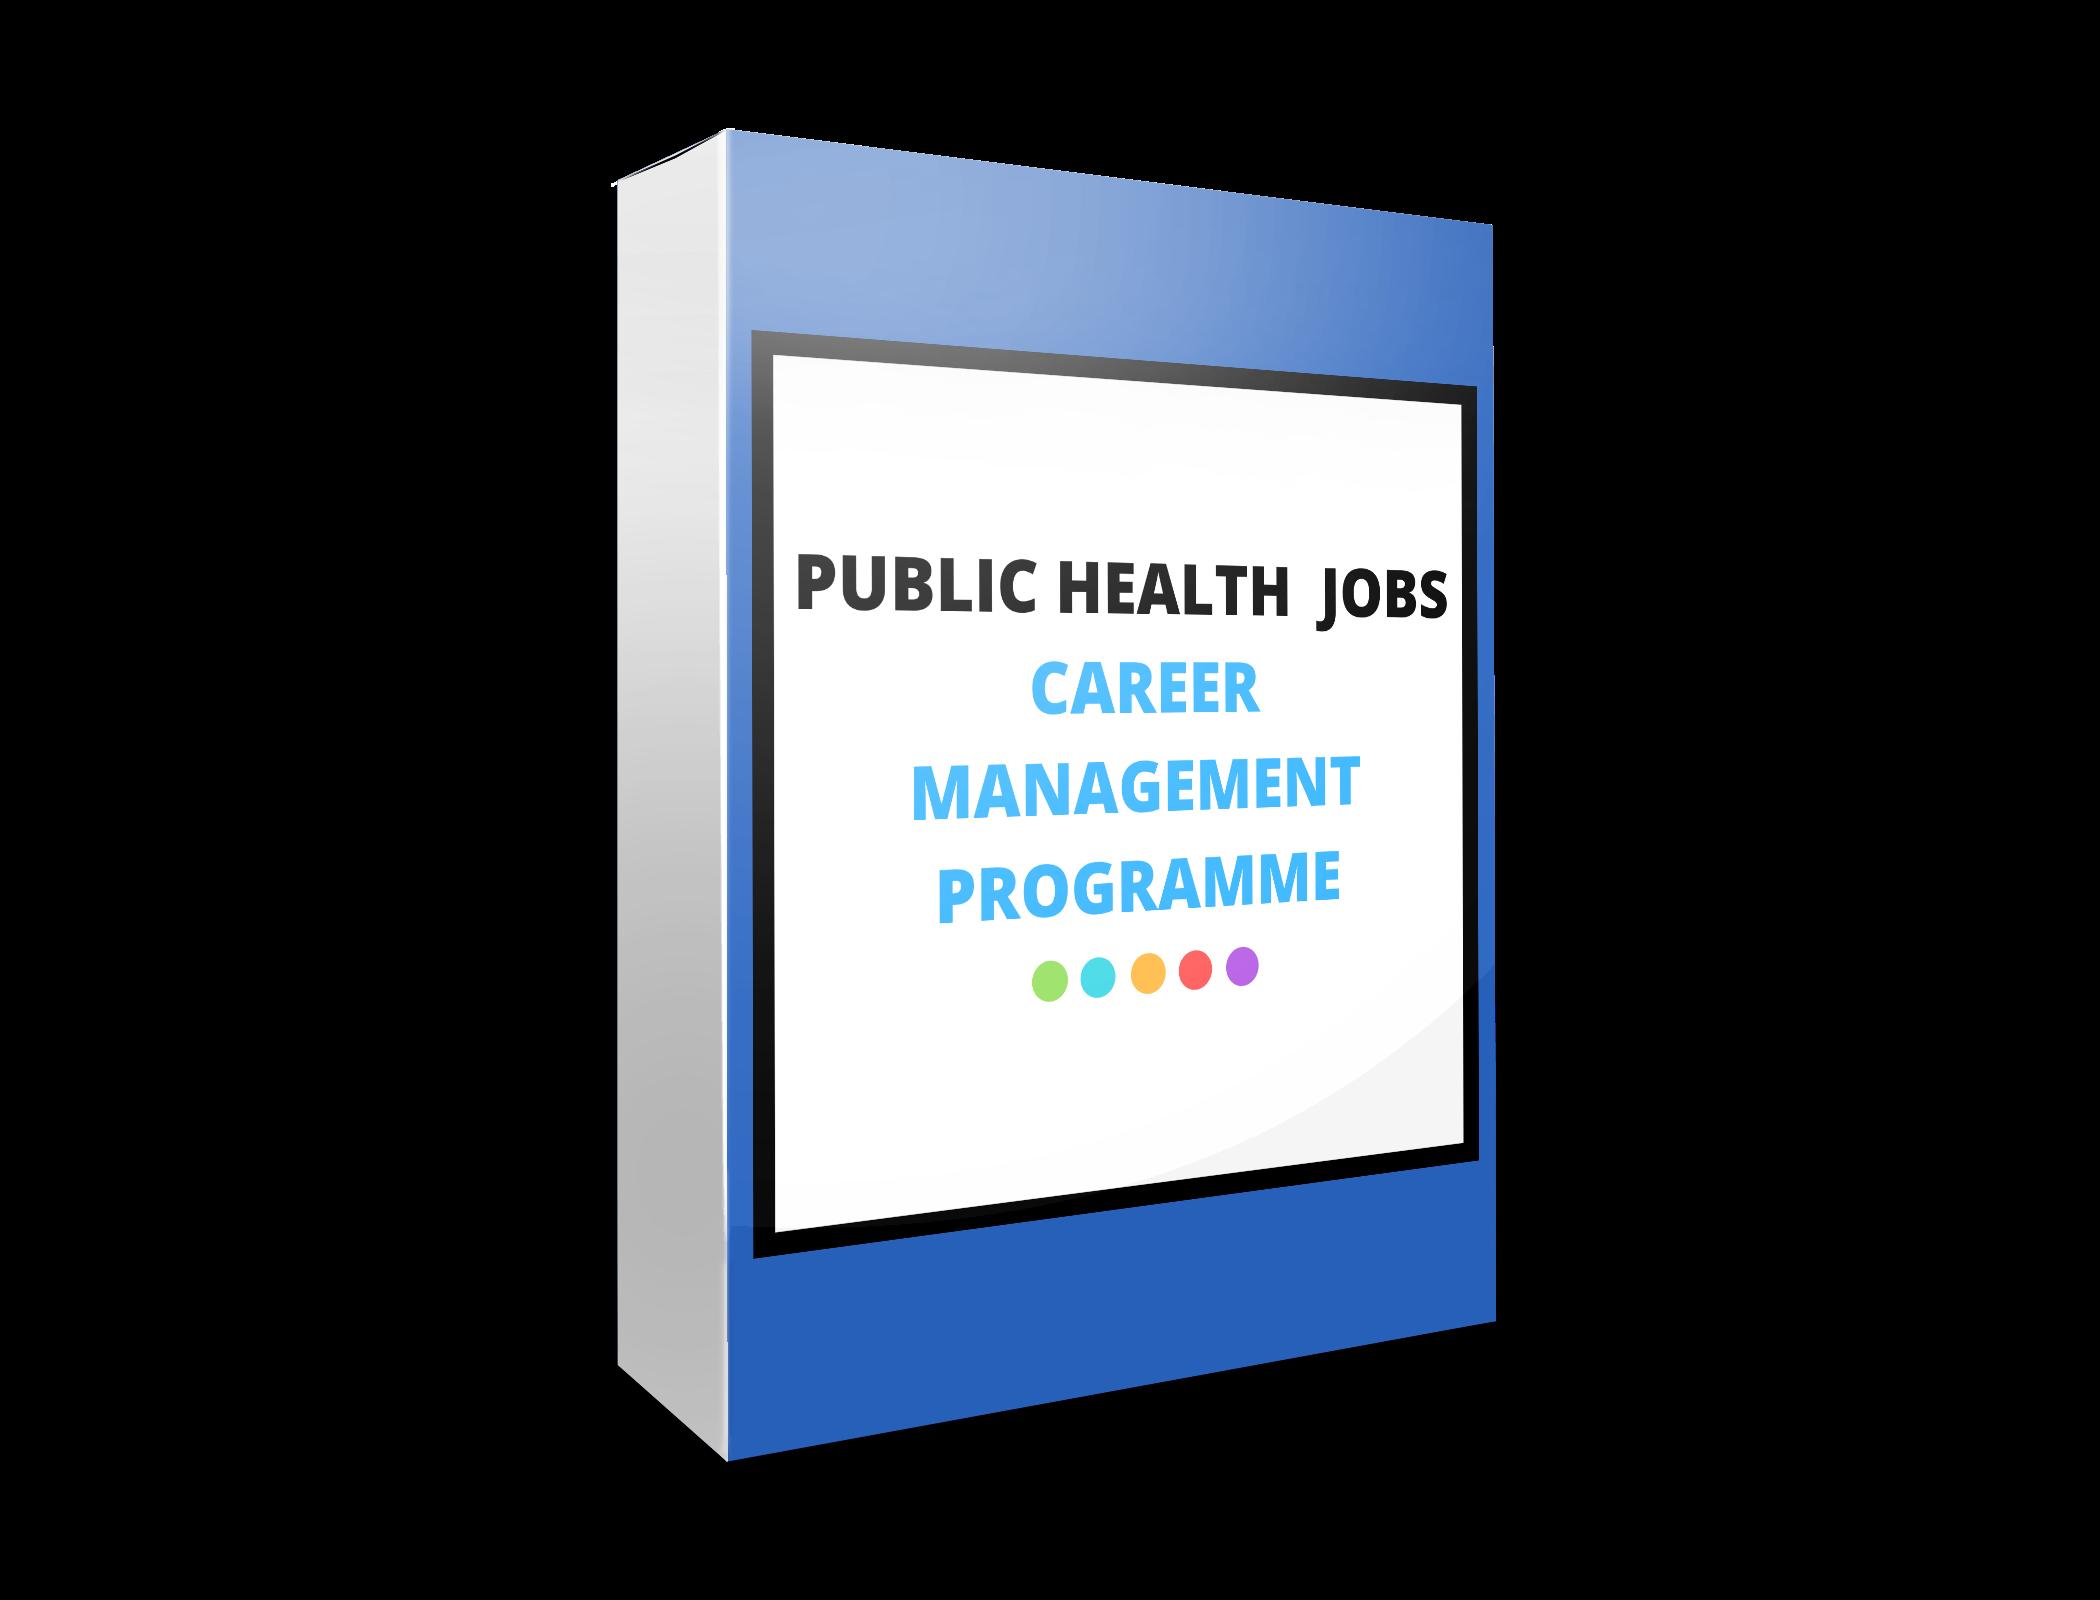 Public Health Career Management Programme